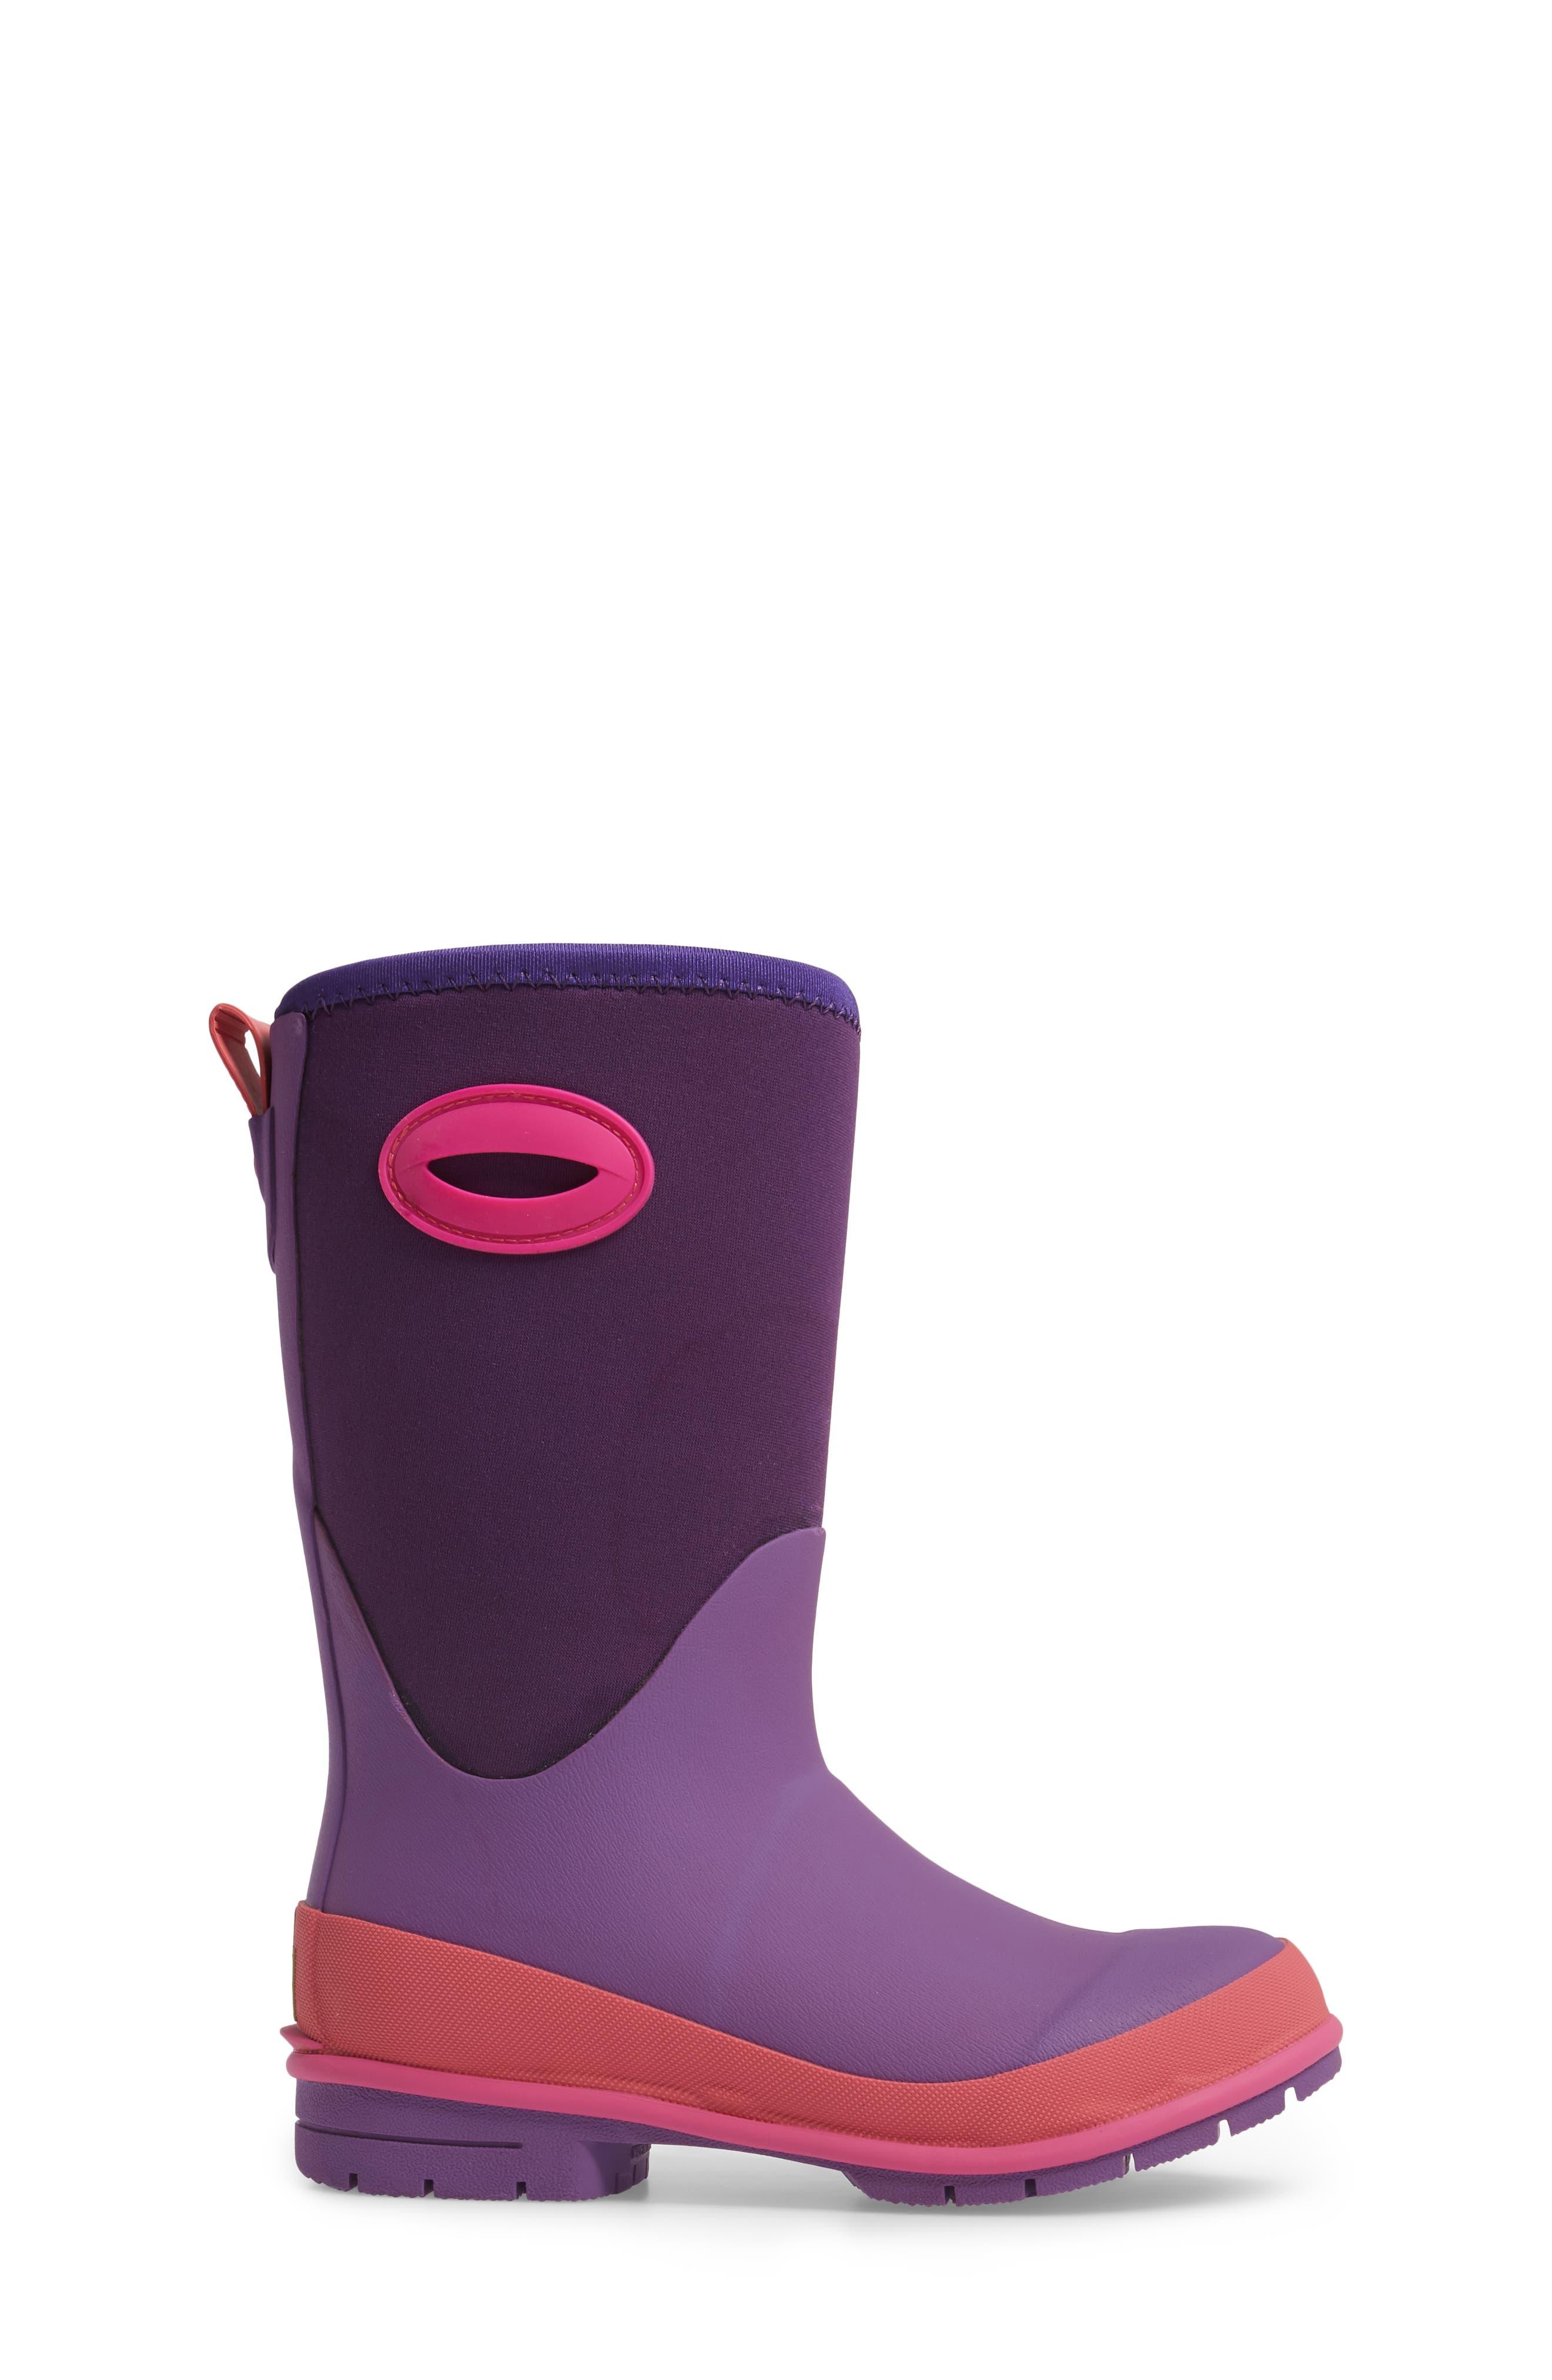 Neoprene Purple Snow Boot,                             Alternate thumbnail 3, color,                             Purple